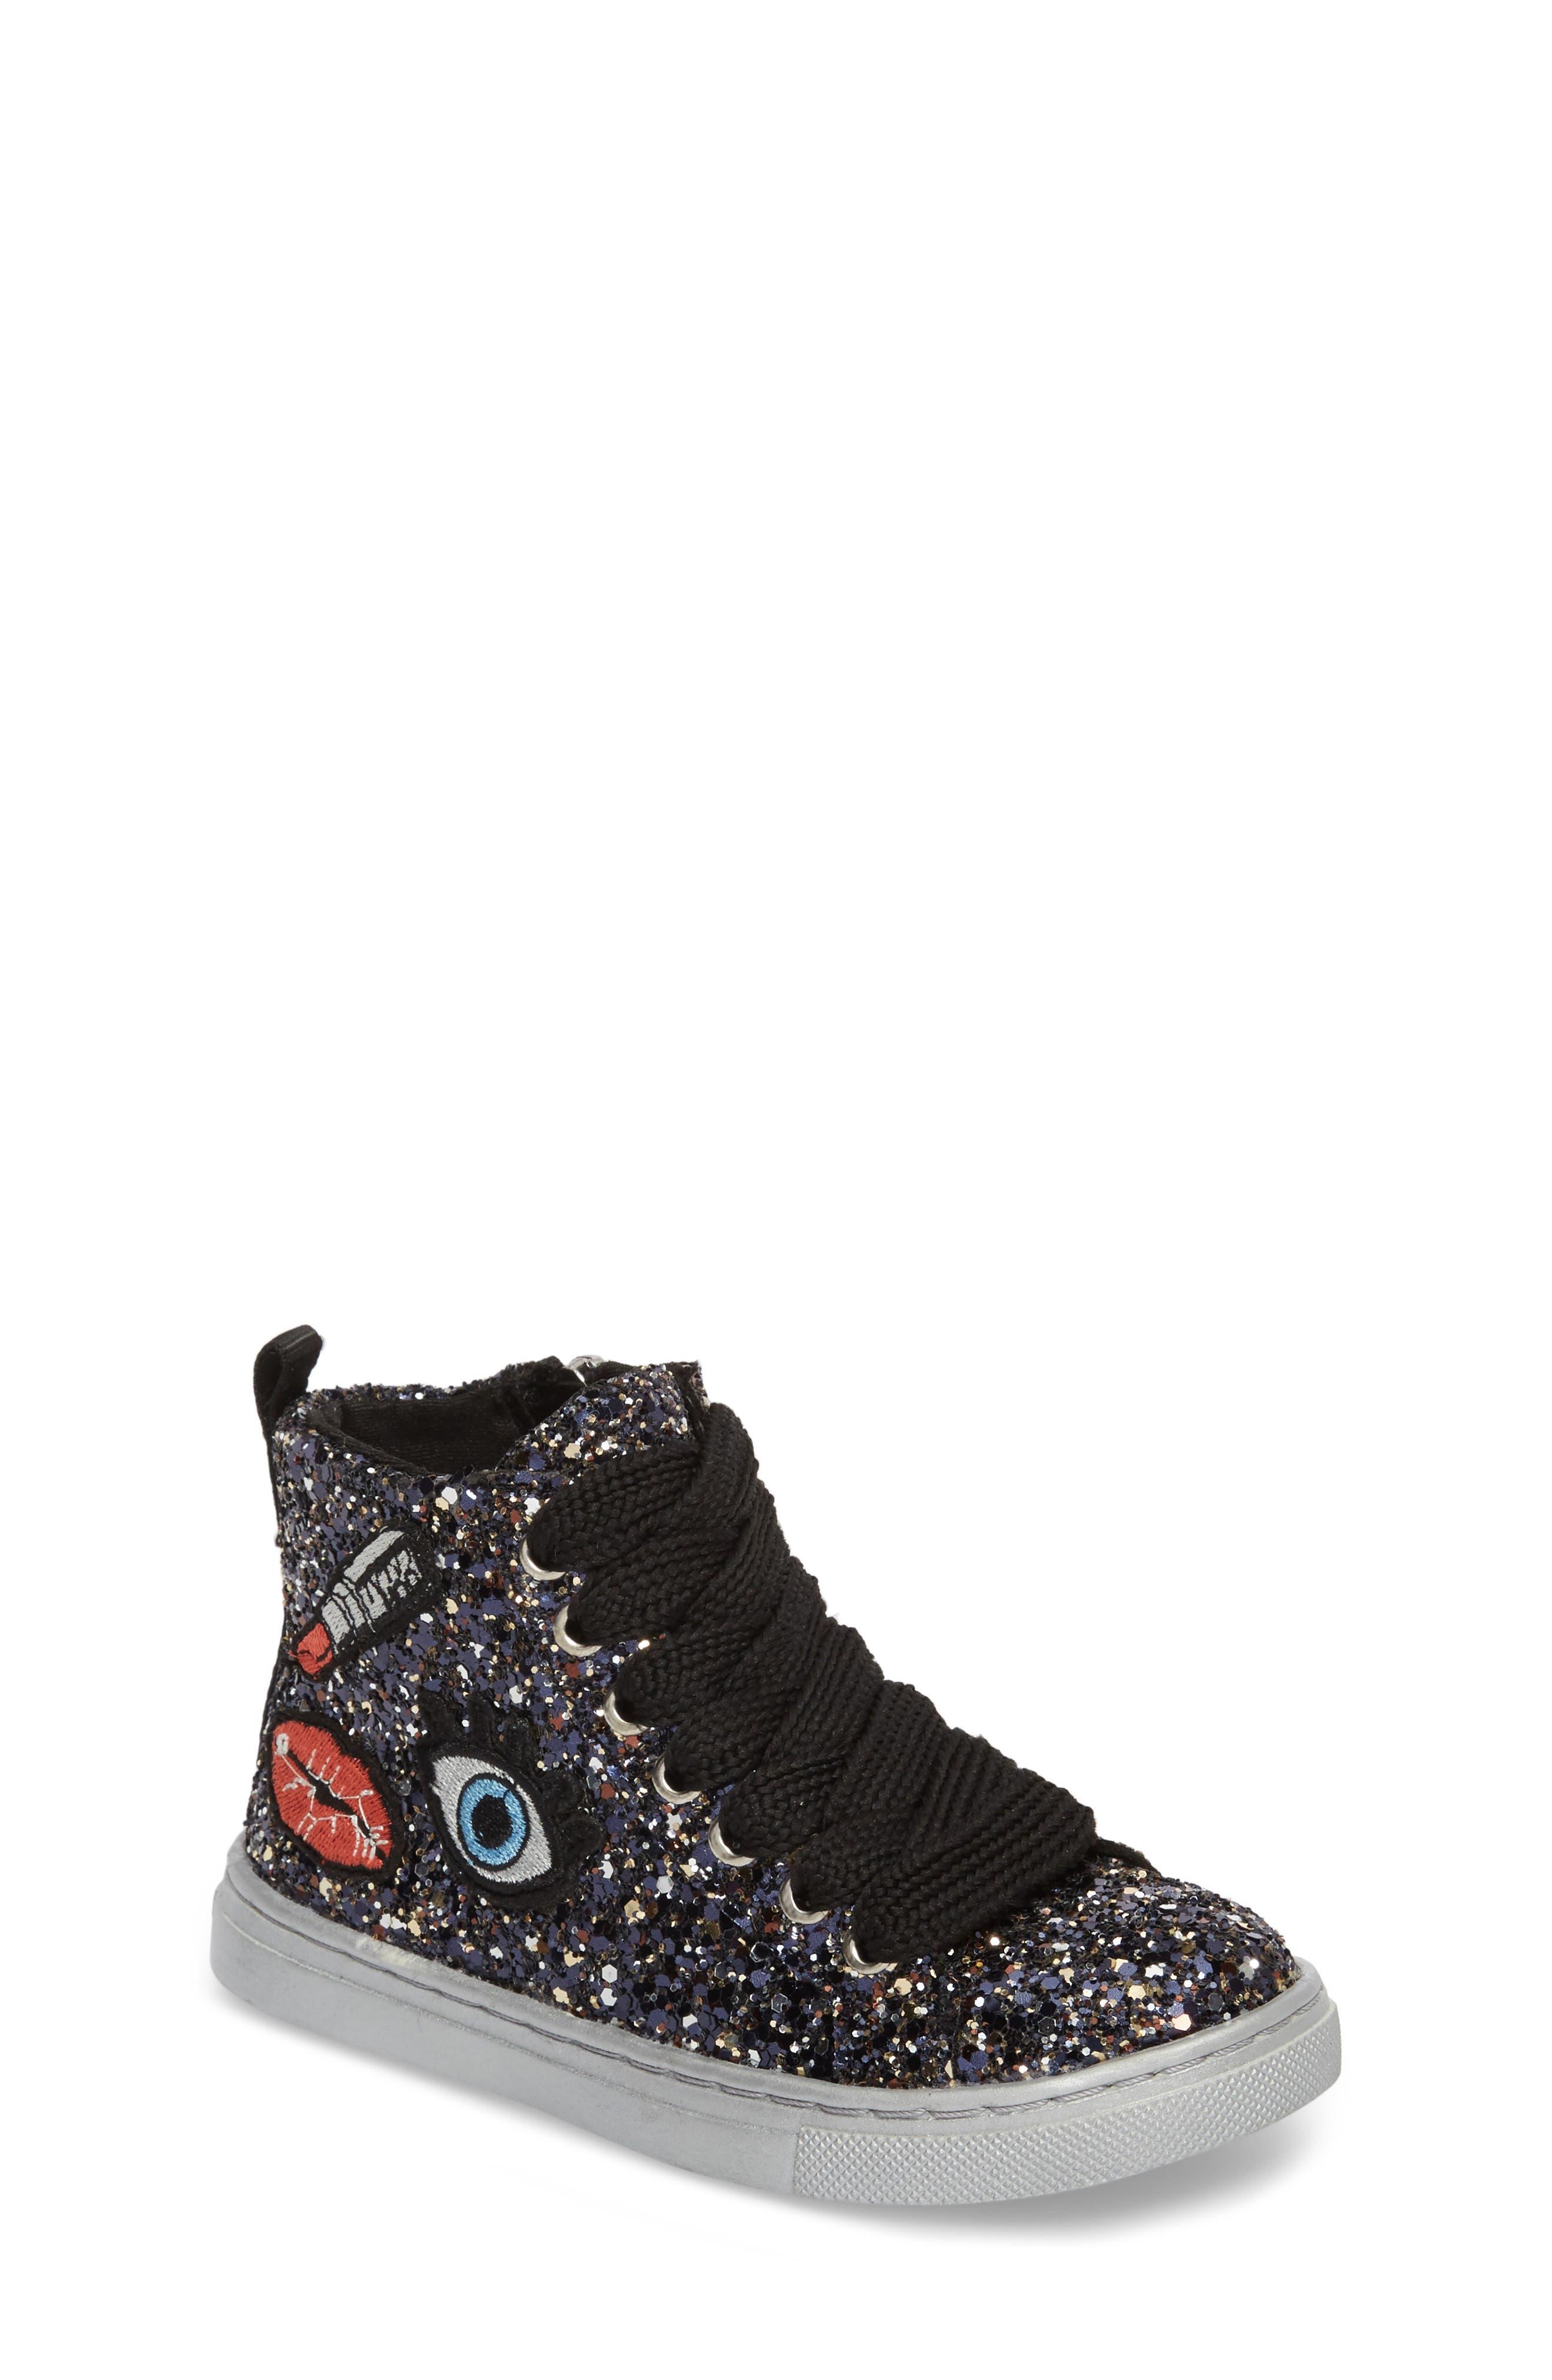 Zaine Glittery High Top Sneaker,                         Main,                         color, 001